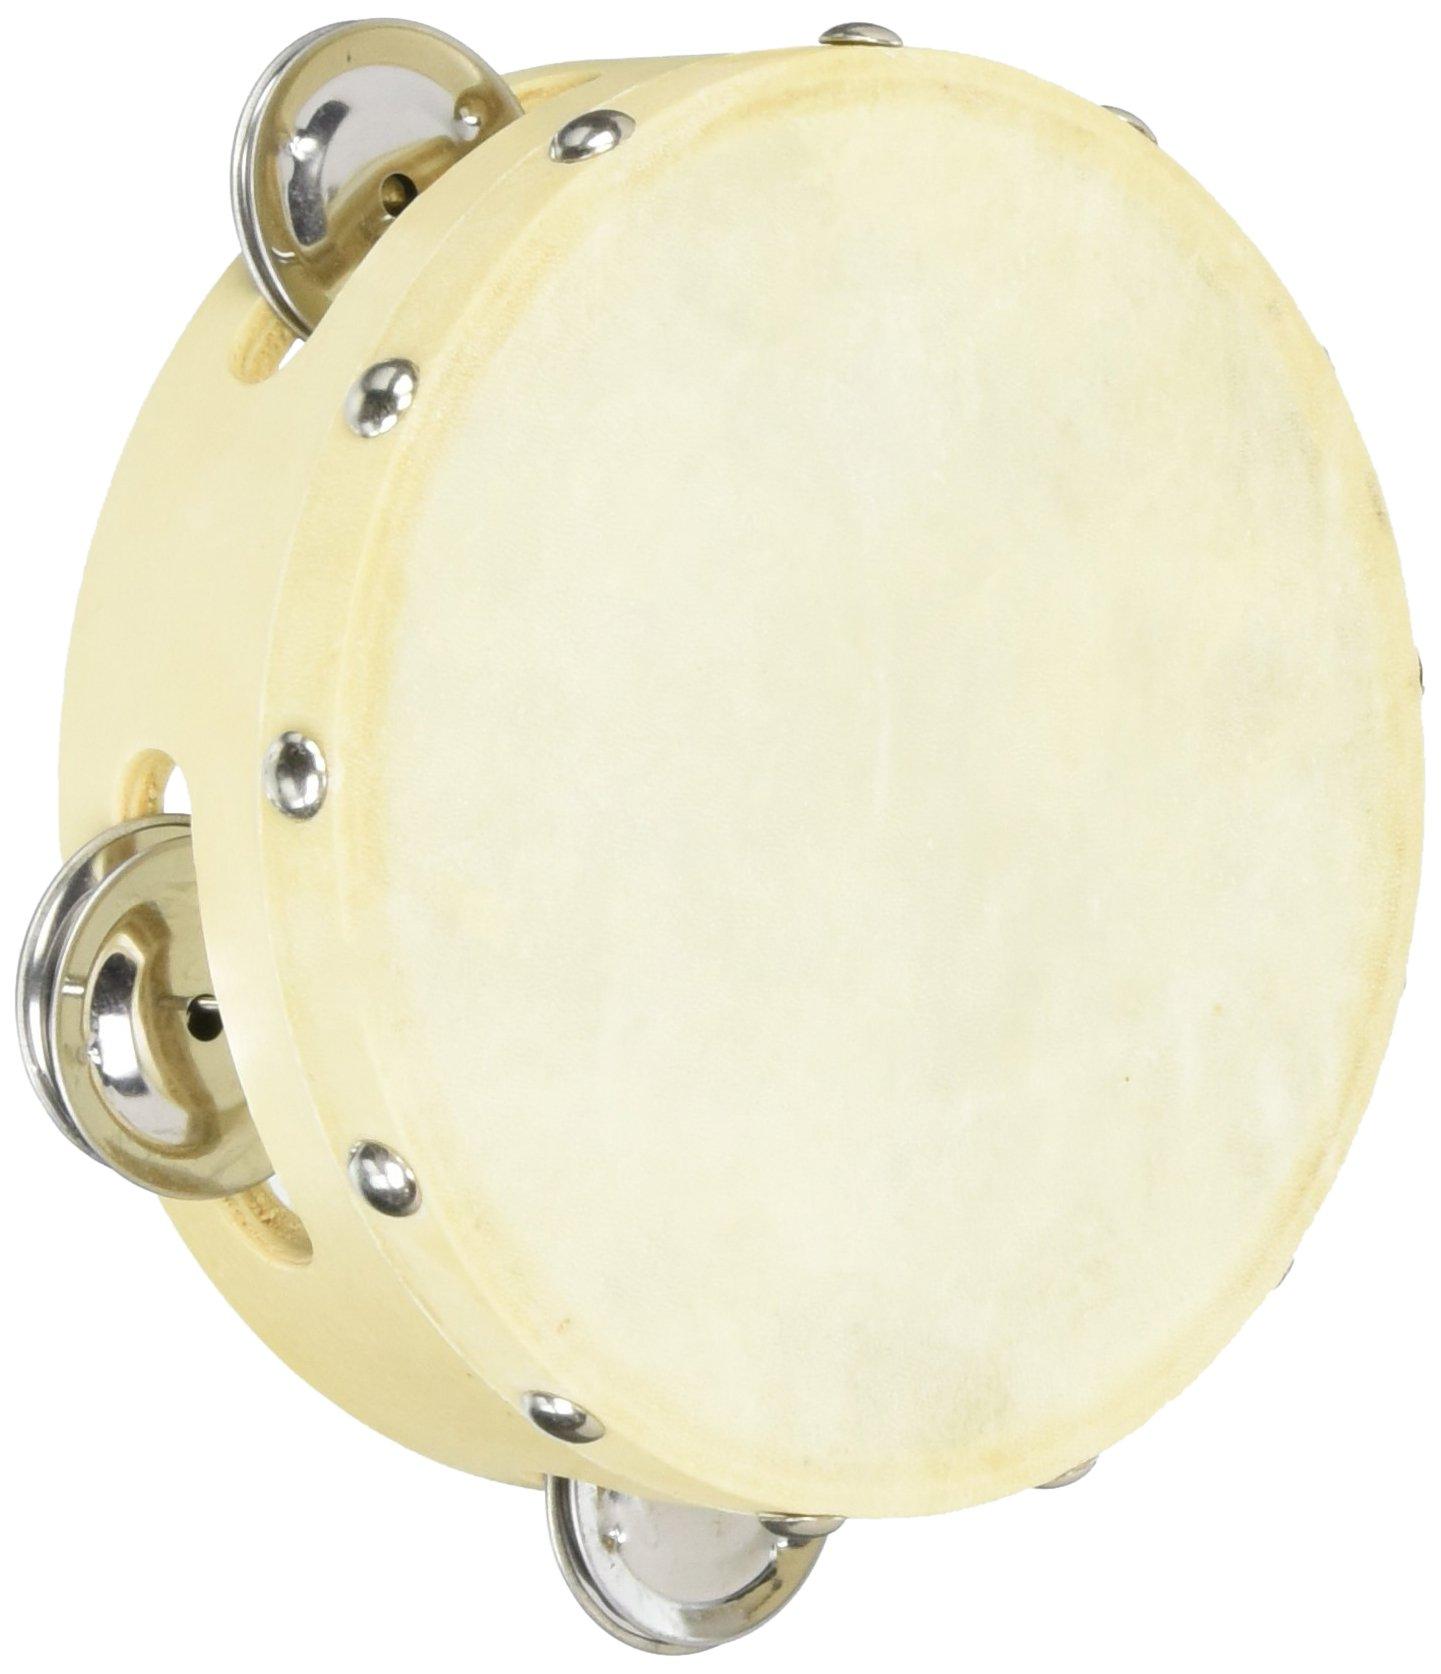 Cannon UPTAMB6S04H 6-Inch Single 4PRS Tambourine with Head